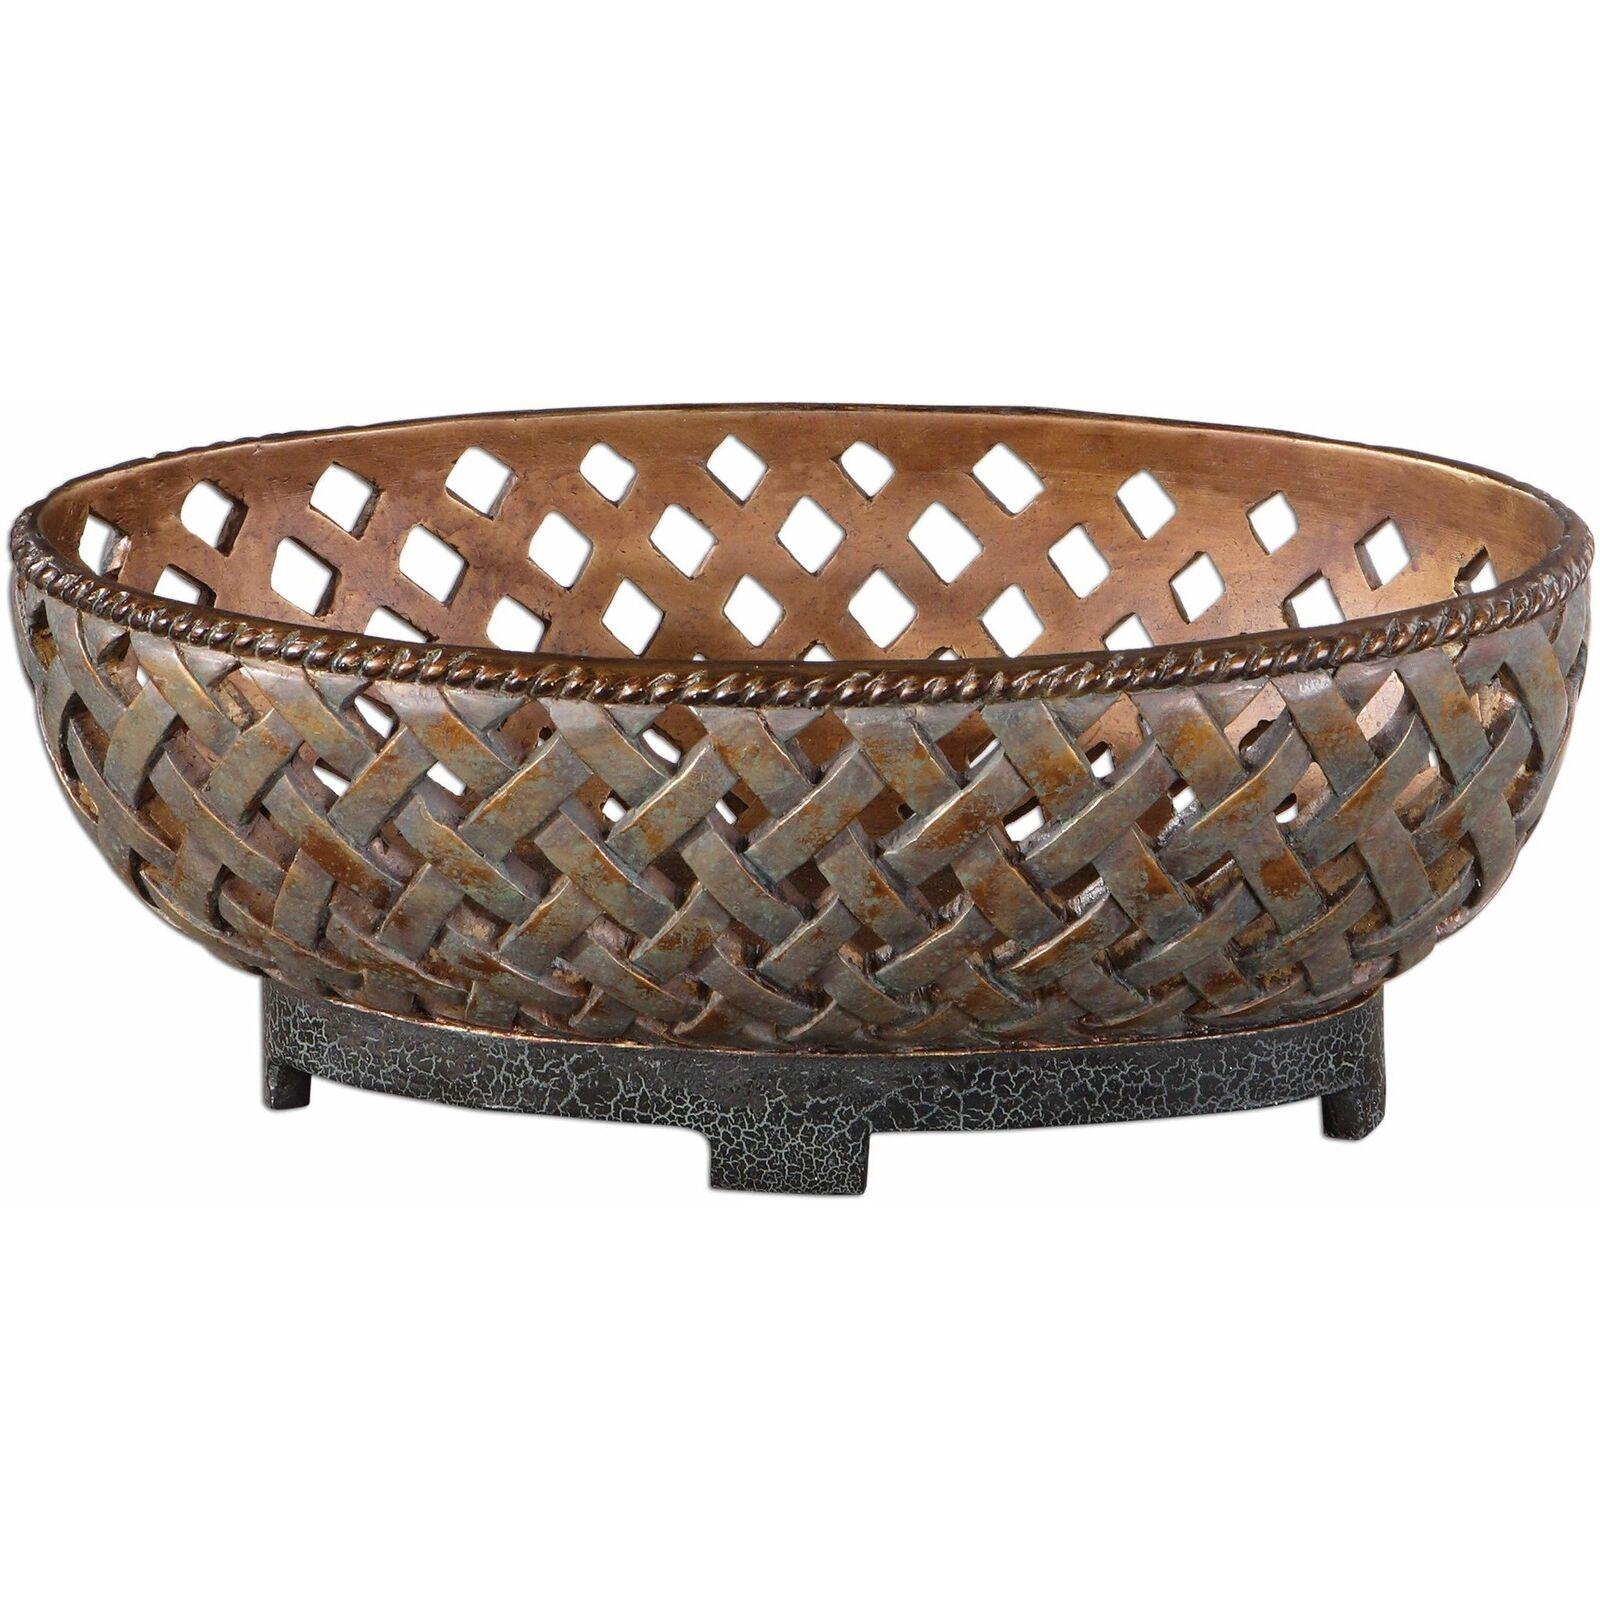 Uttermost Teneh Lattice Weave Design Bowl in Copper Bronze